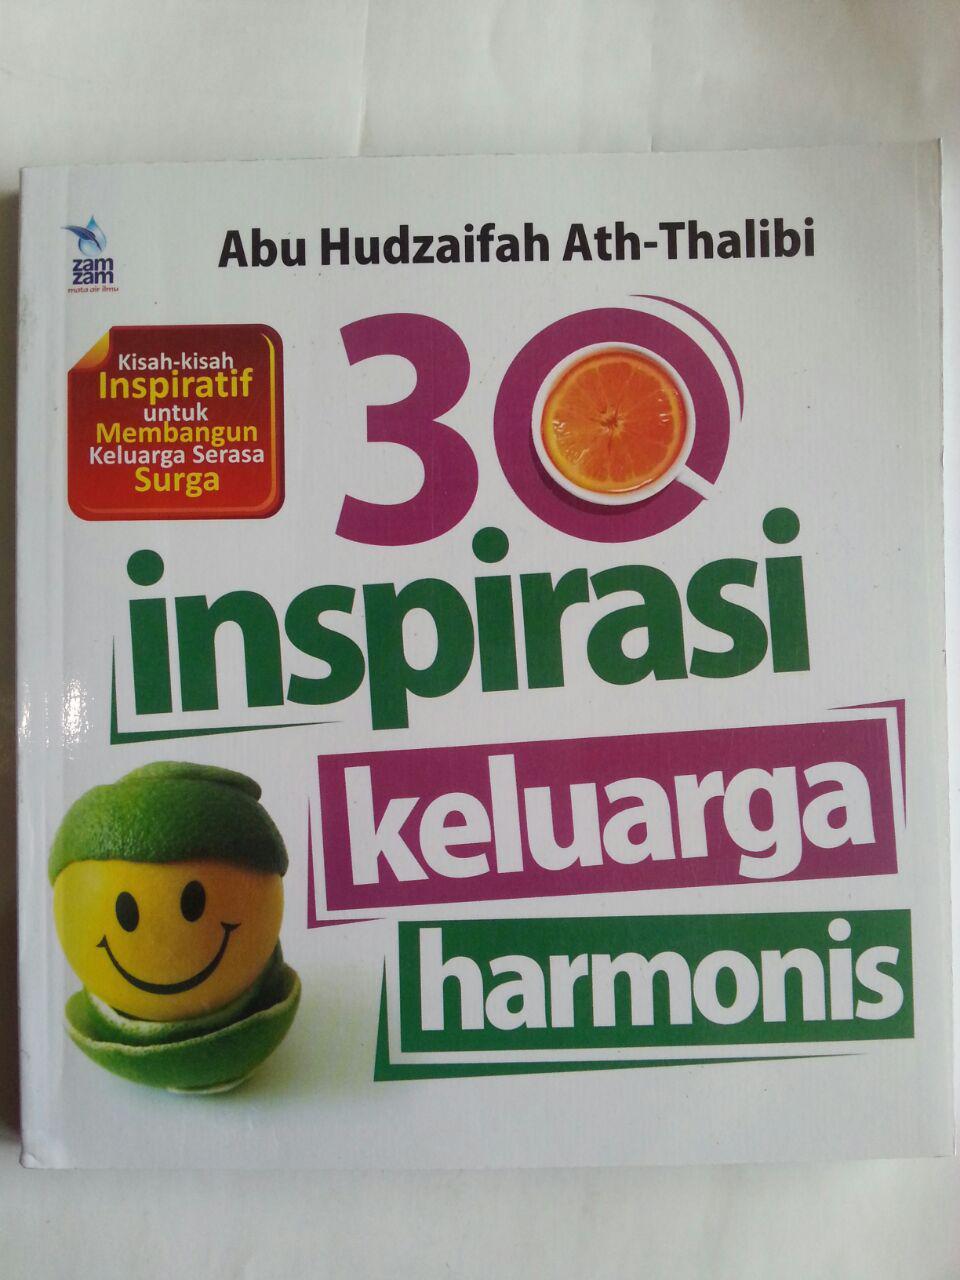 Buku 30 Inspirasi Keluarga Harmonis Kisah-Kisah Inspiratif cover 2